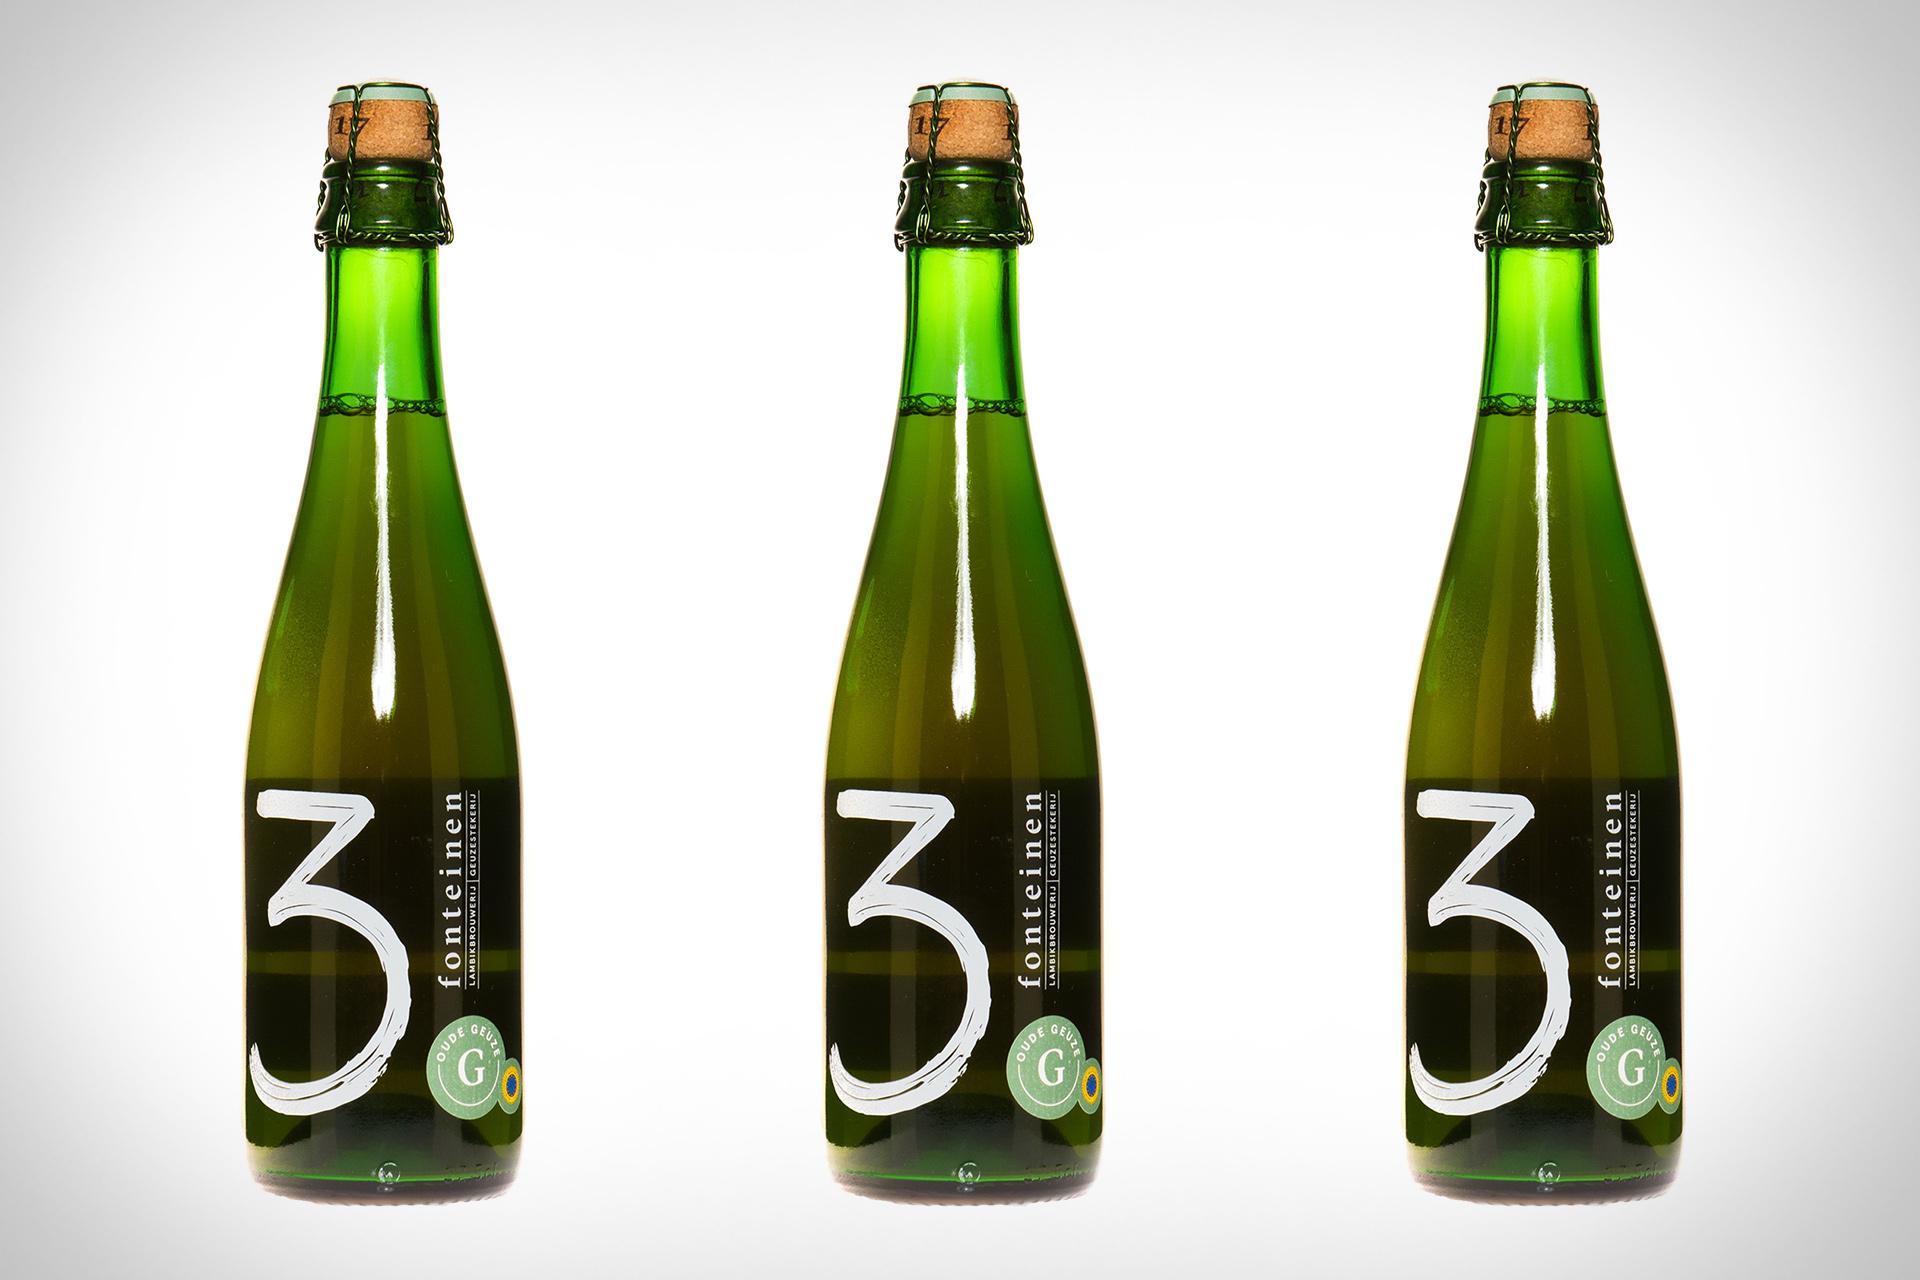 Drie Fonteinen Oude Geuze Bier